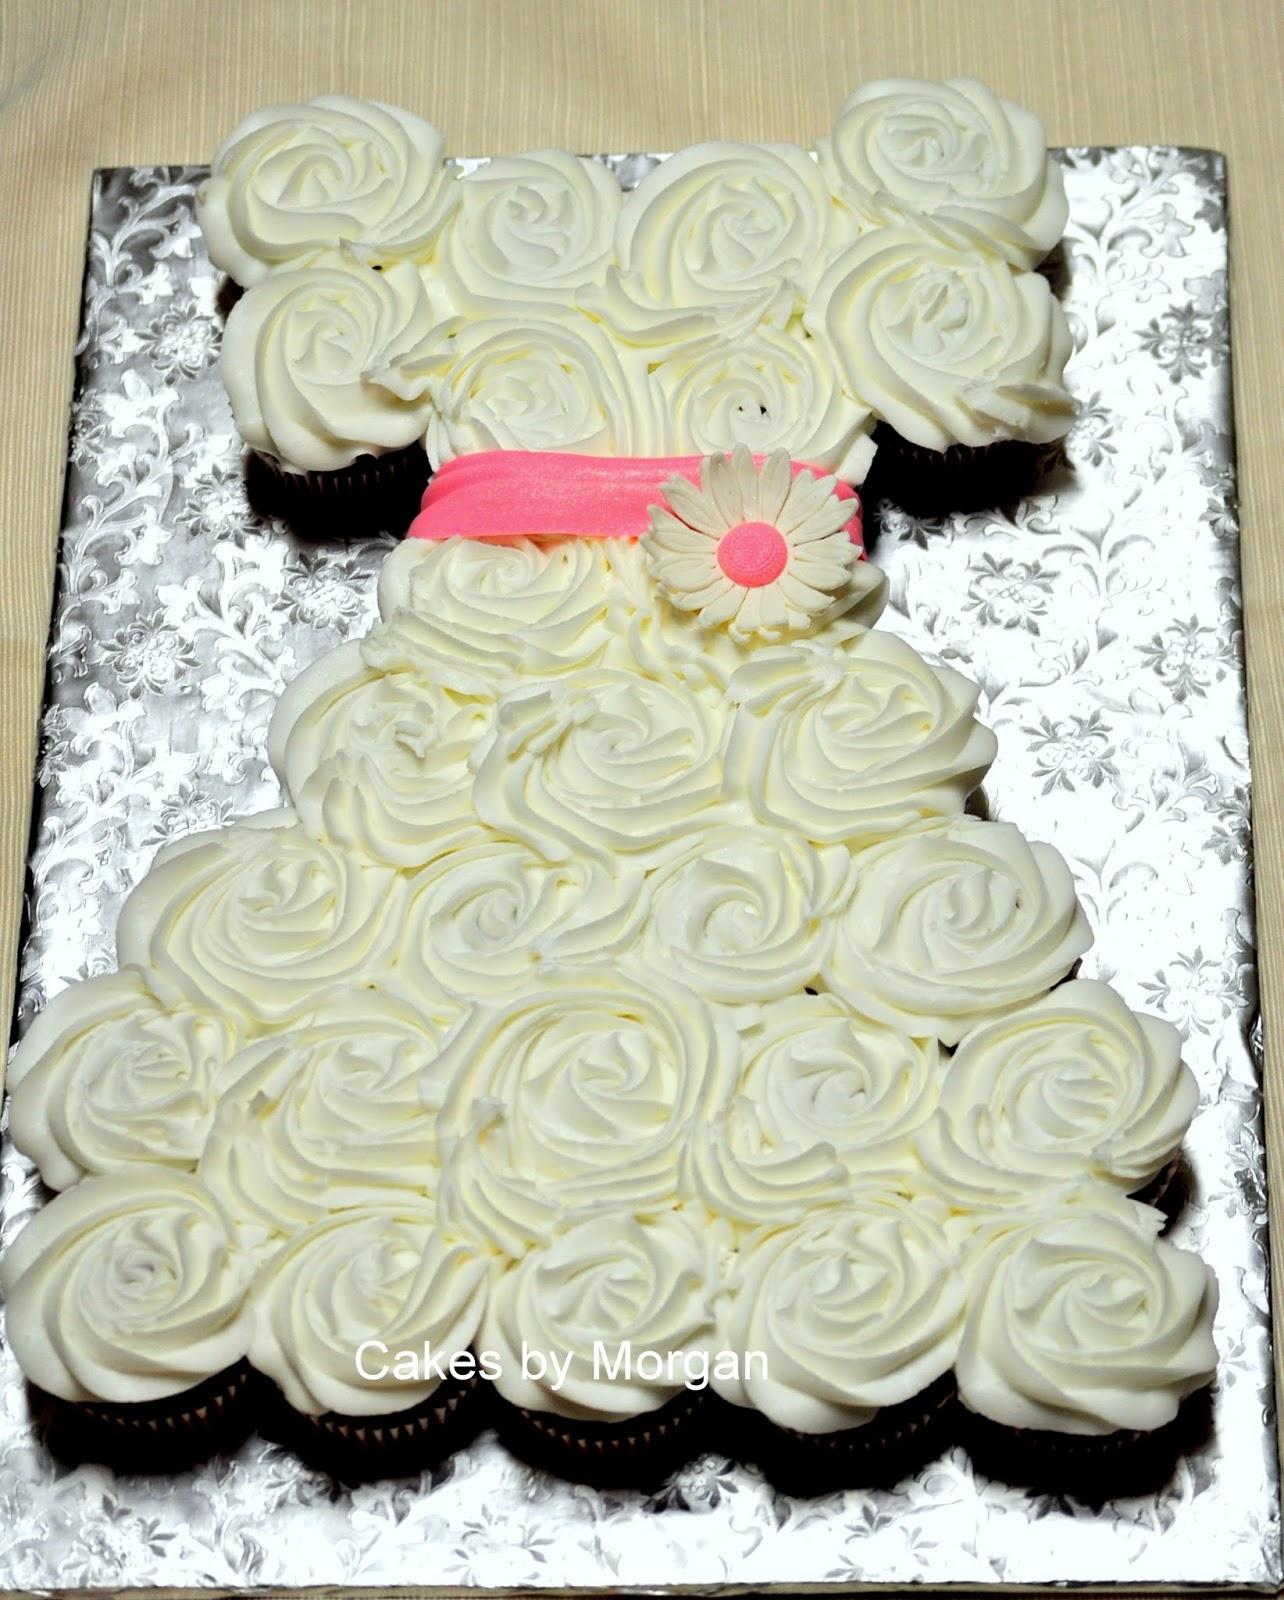 Morgan s cakes cupcake dress